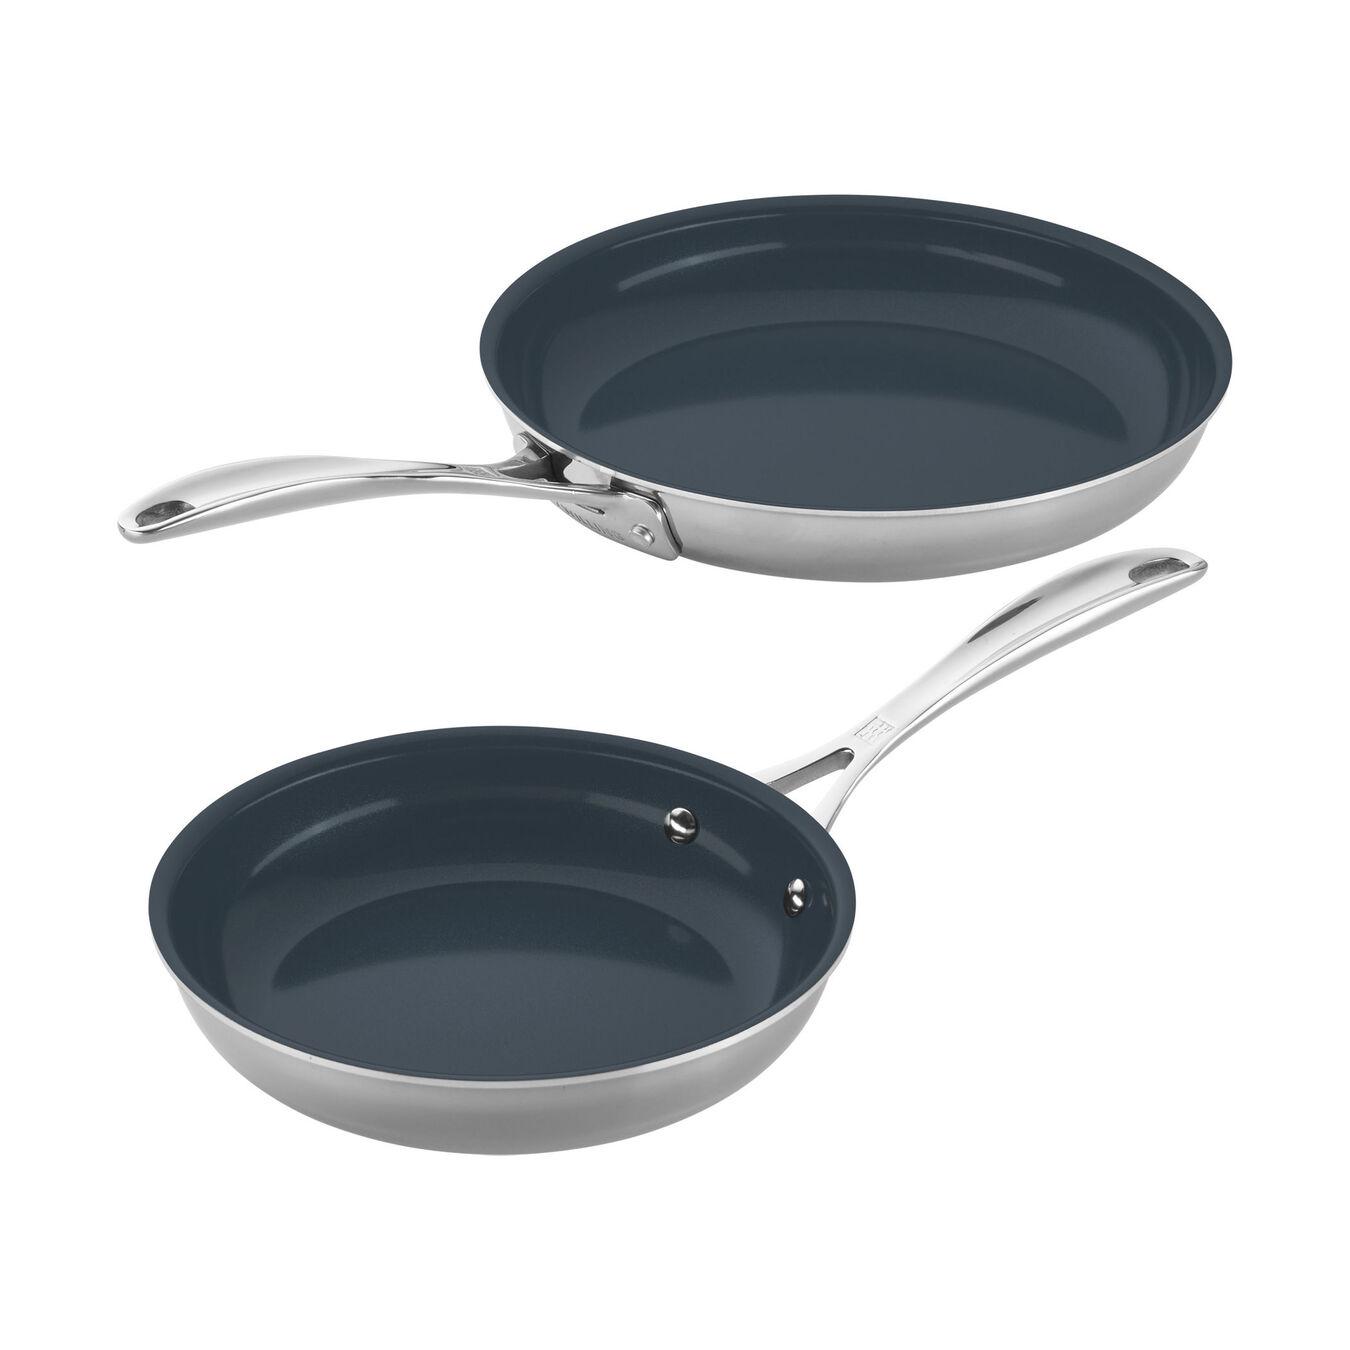 2-pc Stainless Steel Ceramic Nonstick Fry Pan Set,,large 1